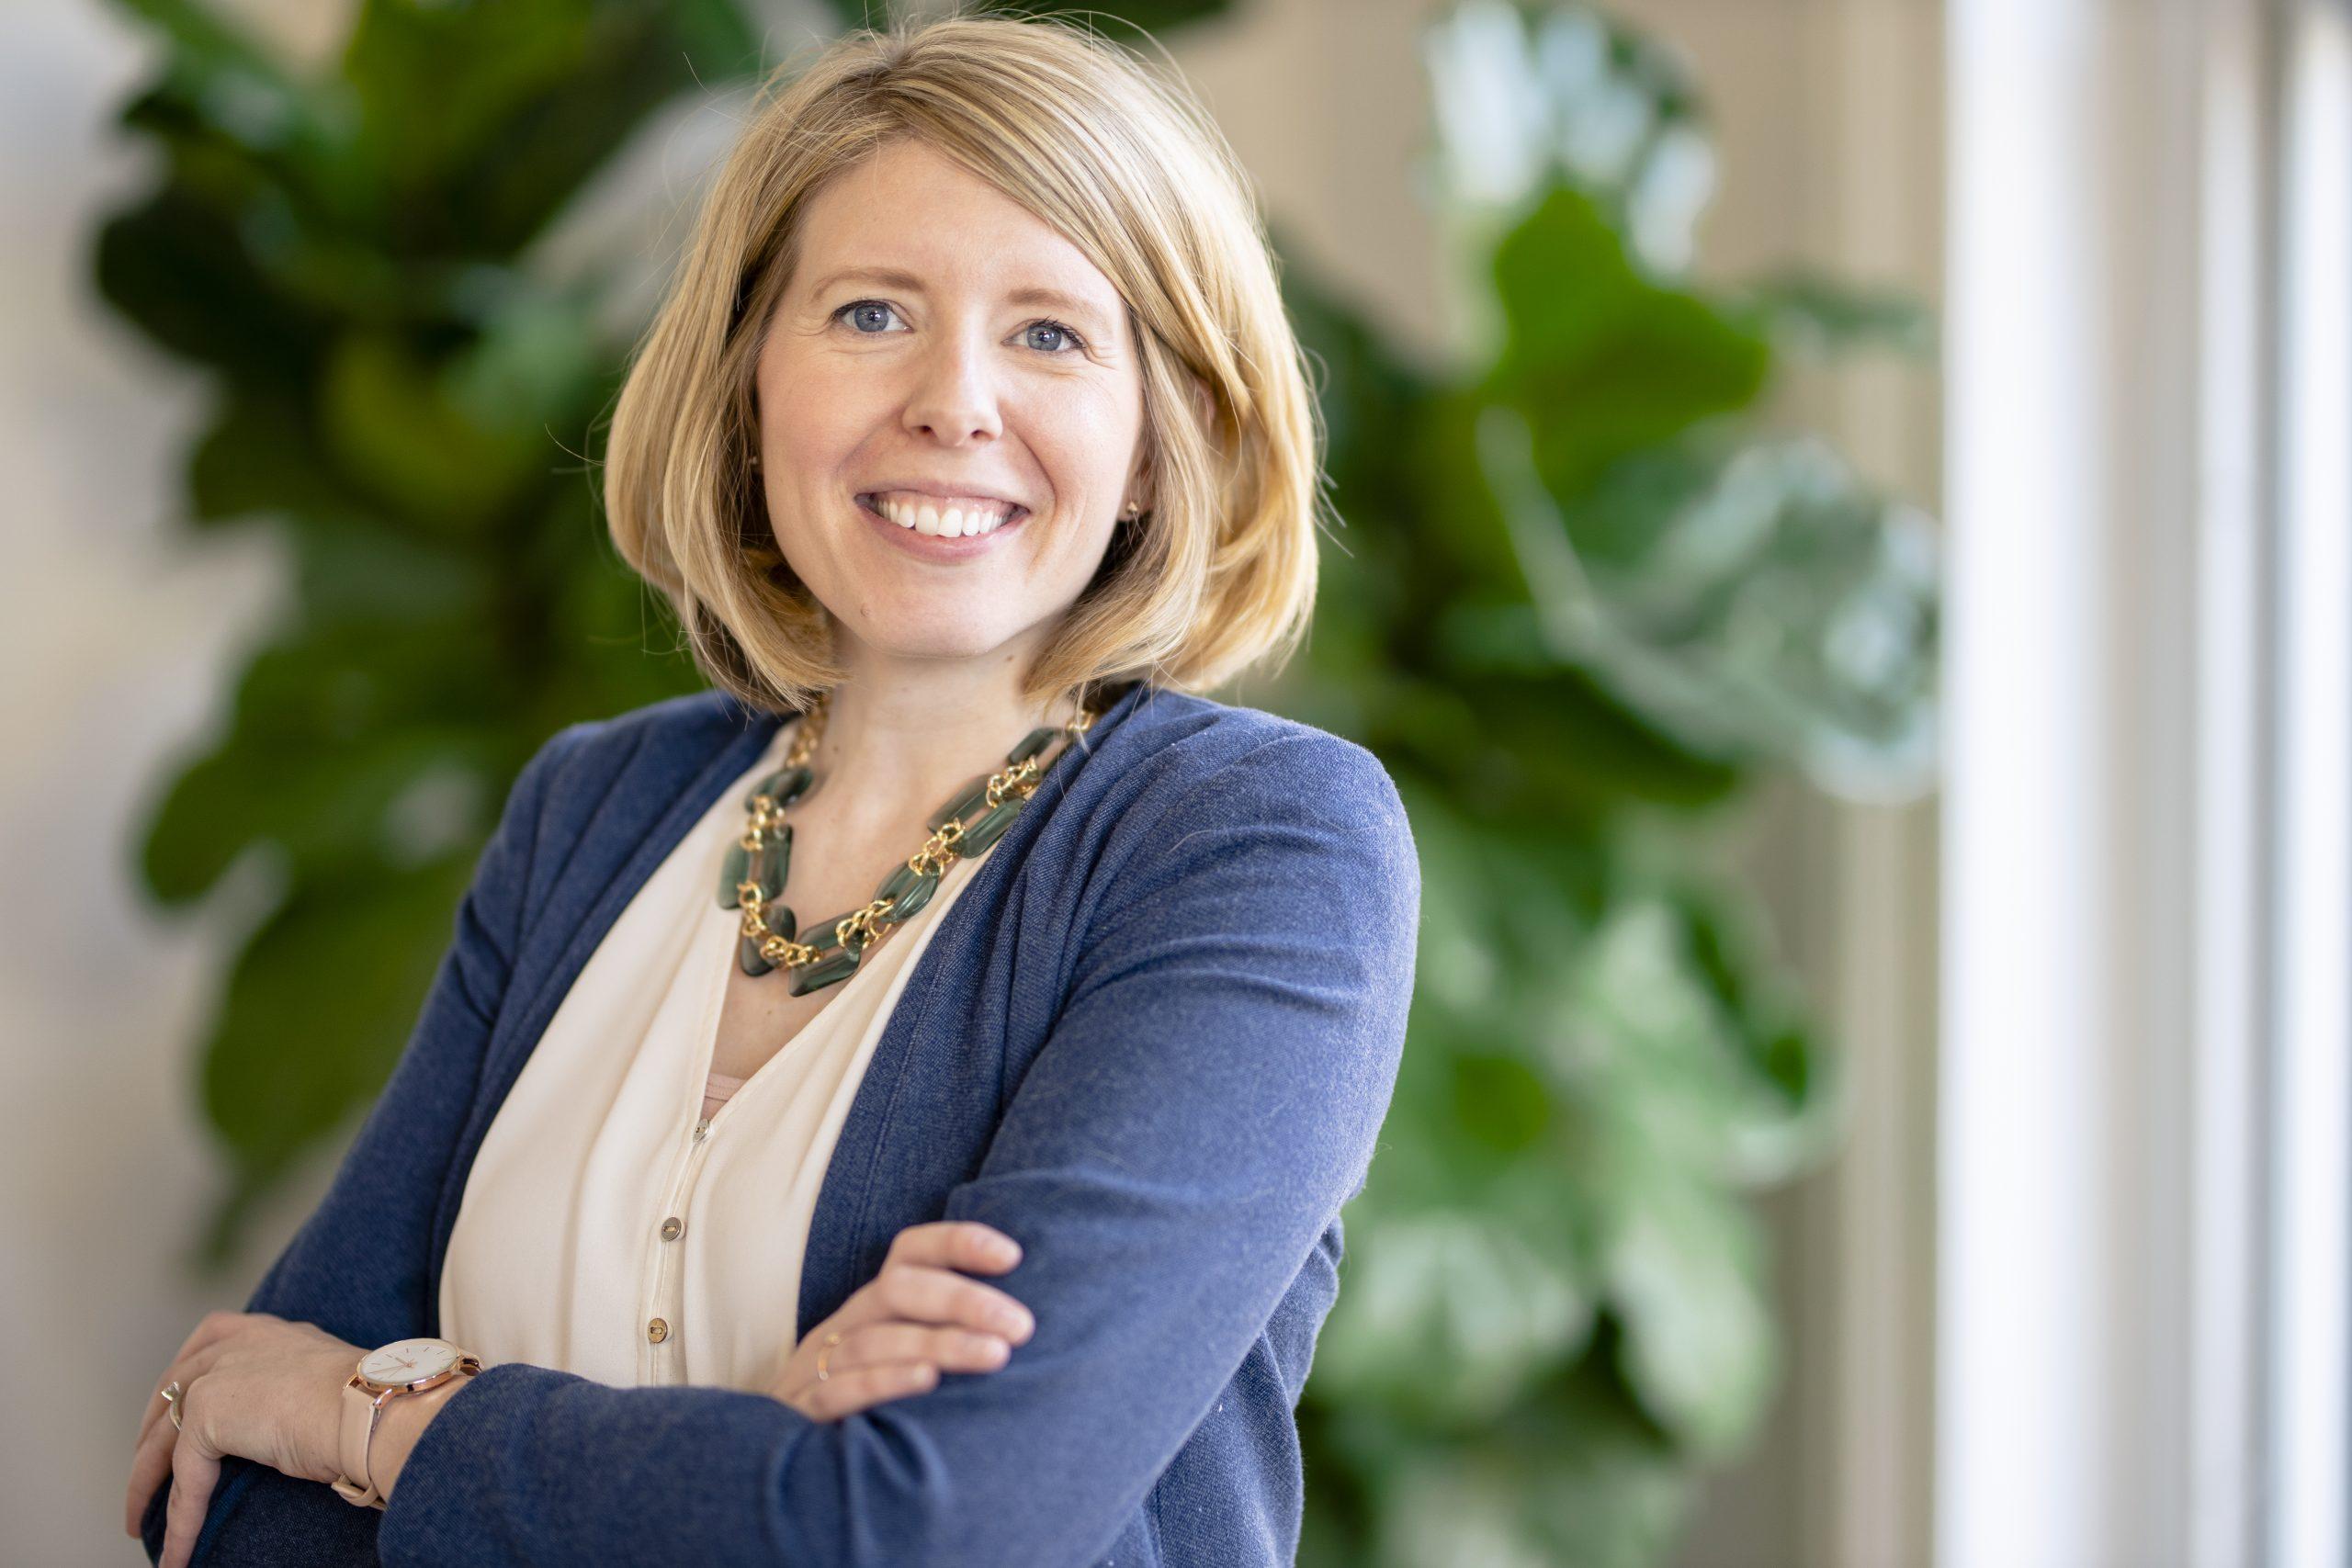 Photo of Rebecca Hanlon, owner of Our York Media